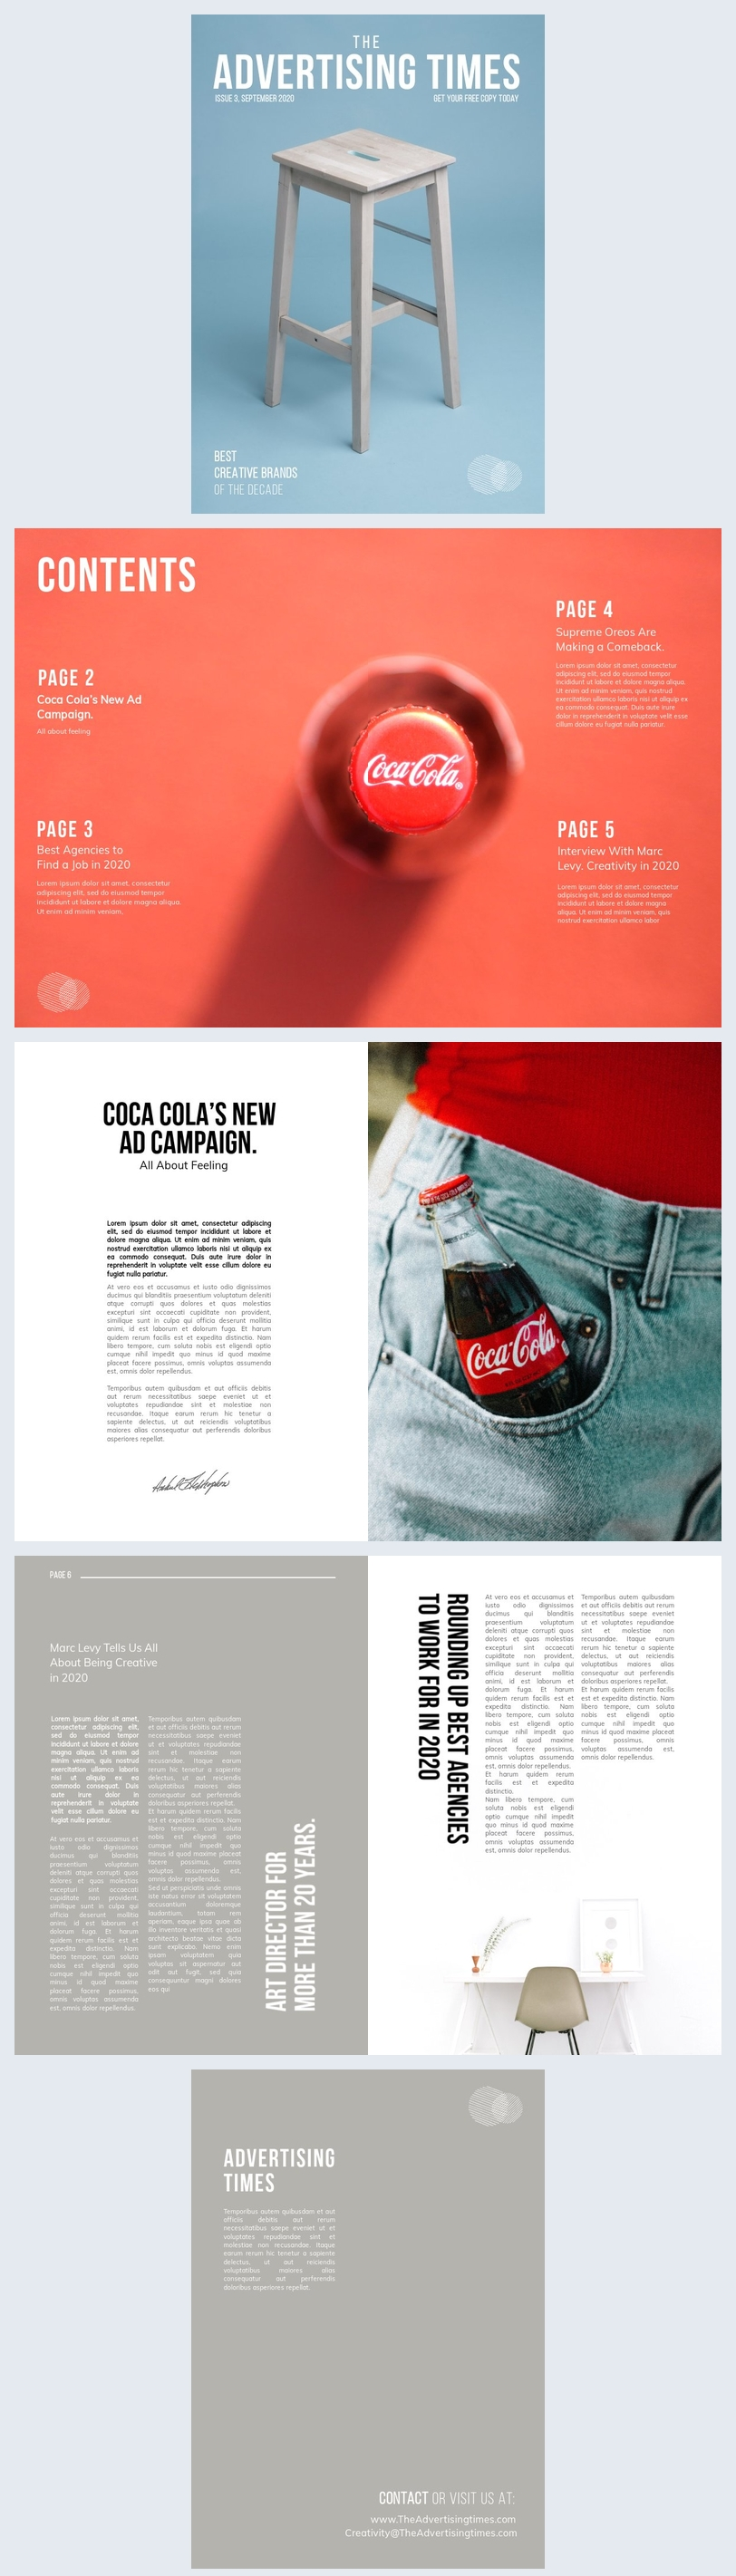 Diseño para revista publicitaria